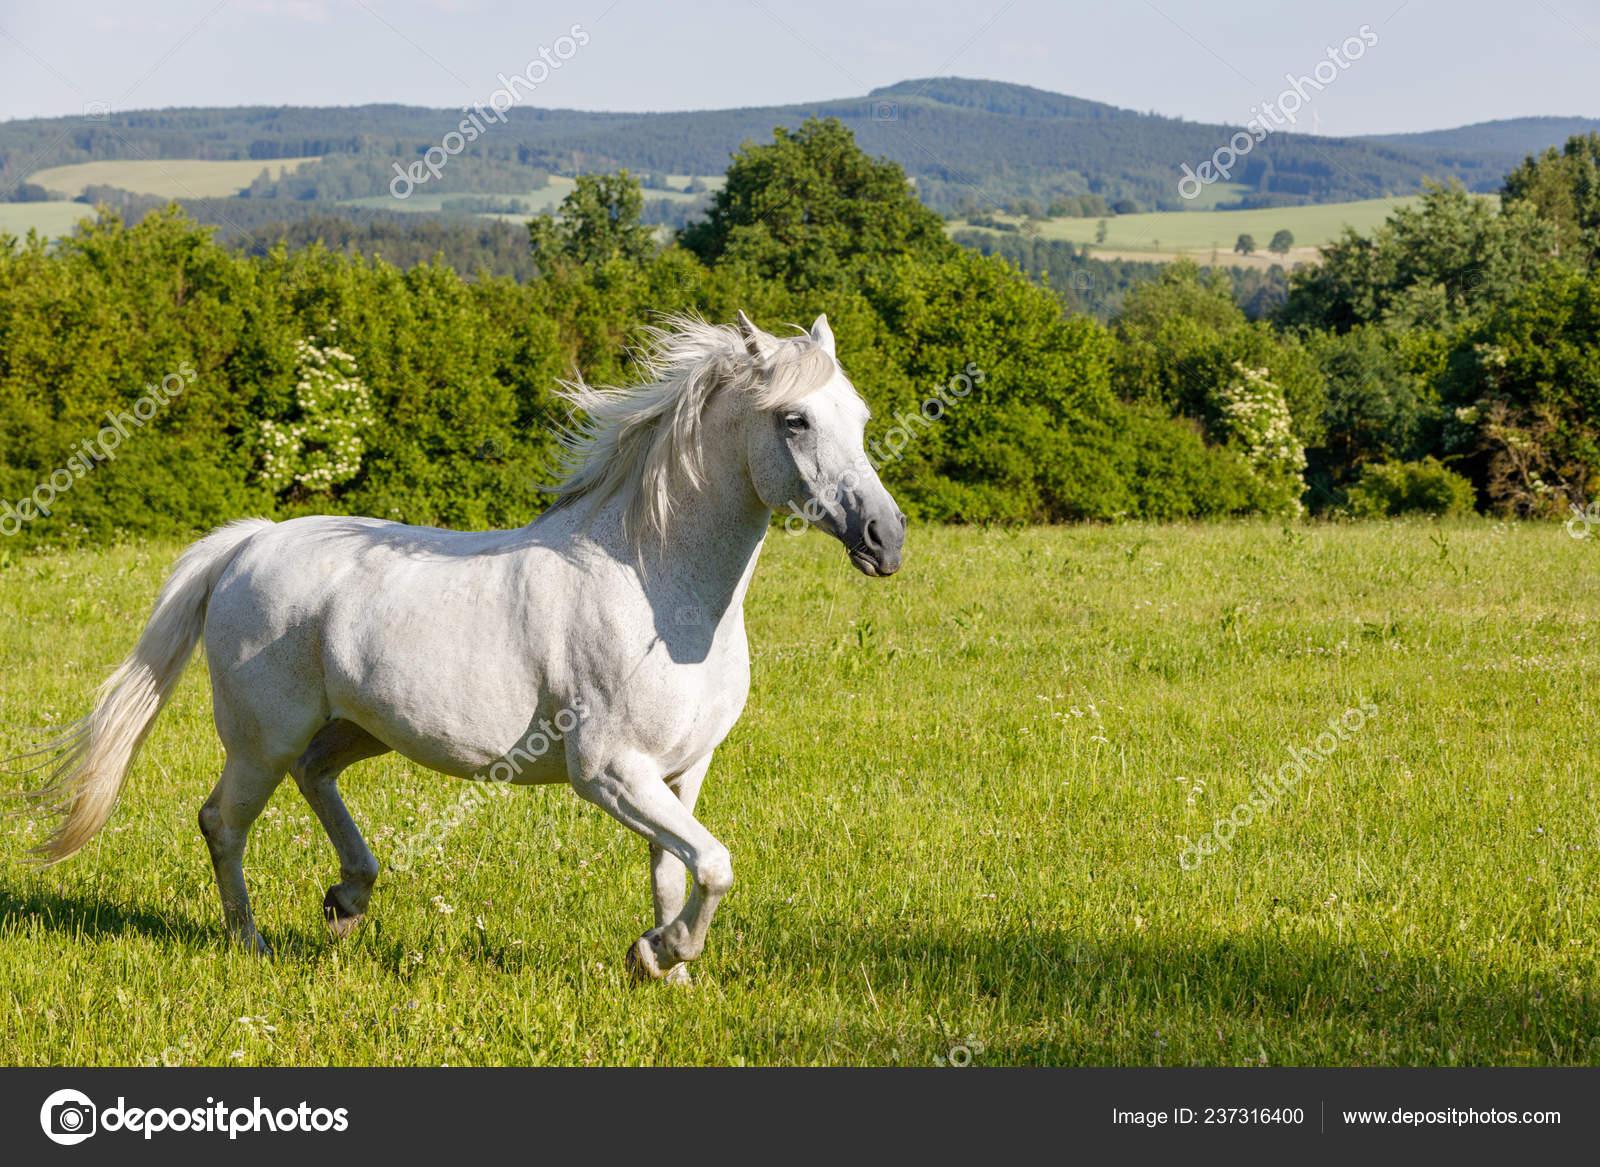 Beautiful White Horse Running Spring Pasture Meadow Farm Countryside Rural Stock Photo C Artush 237316400